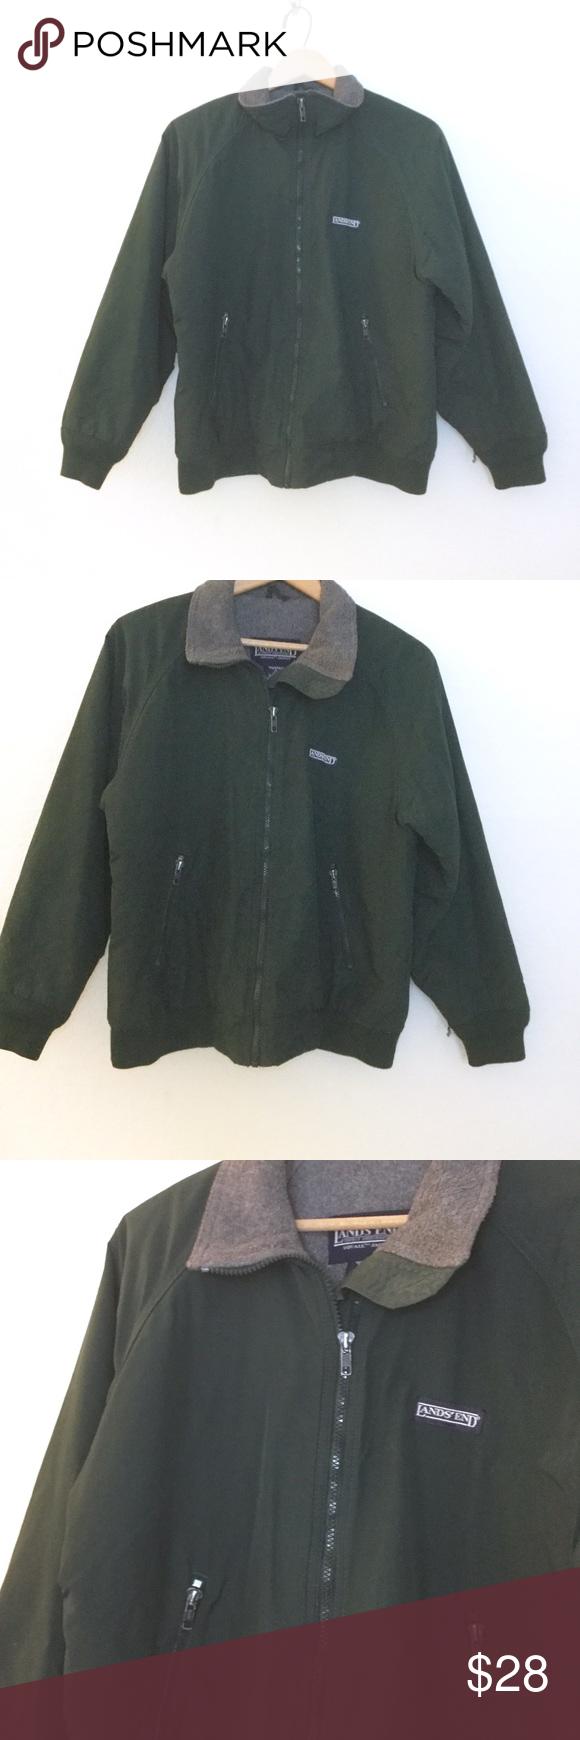 Landsu end vintage squall fleece jacket pinterest